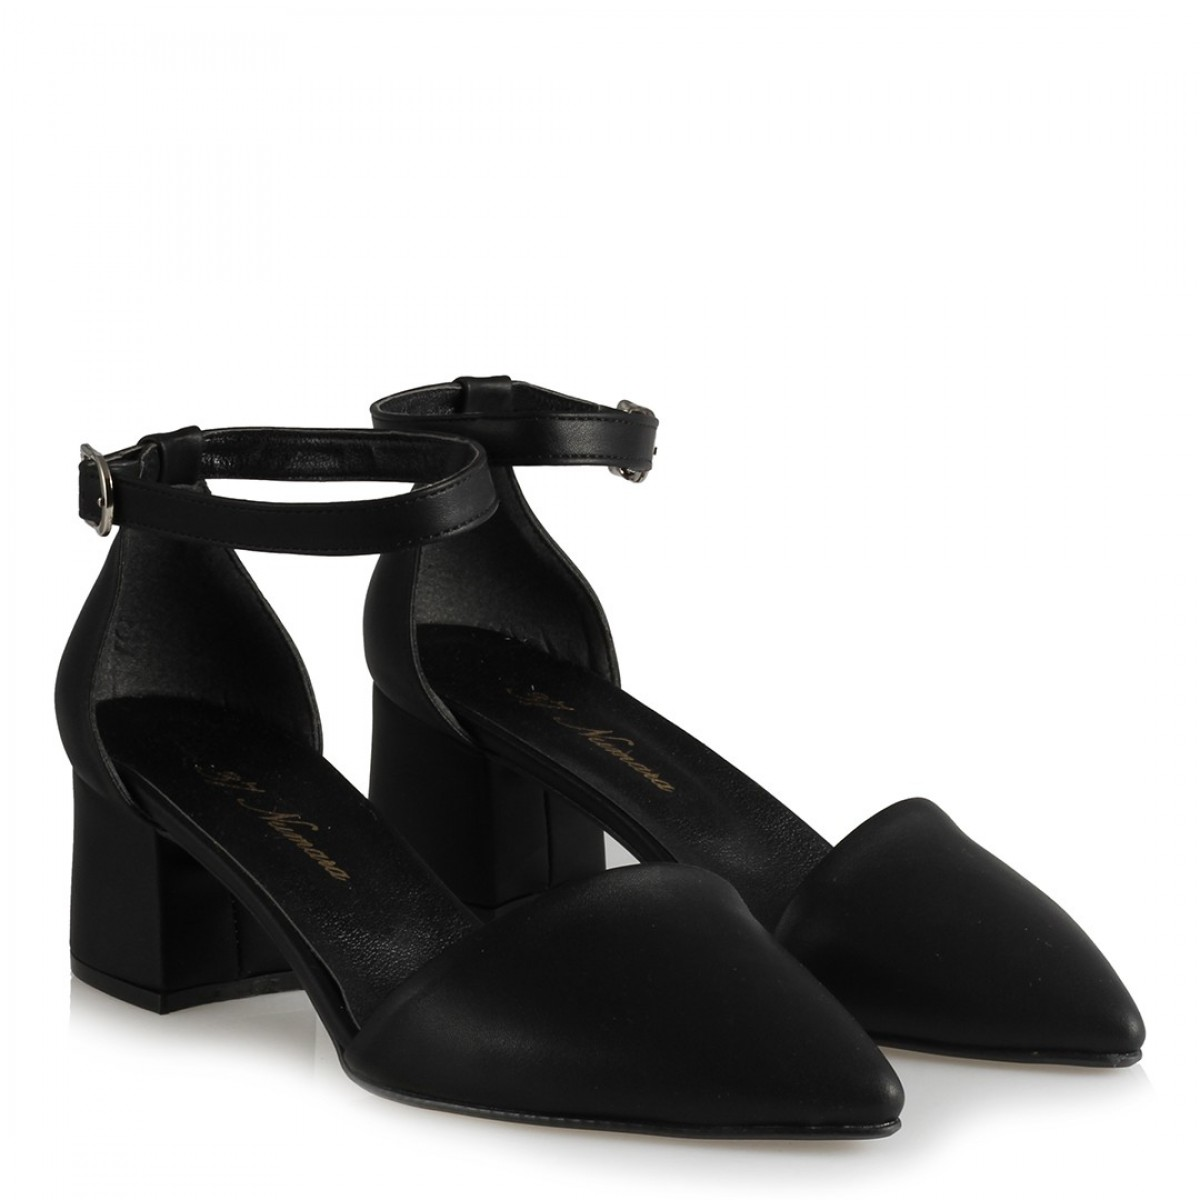 Az Topuklu Stiletto Ayakkabı Siyah